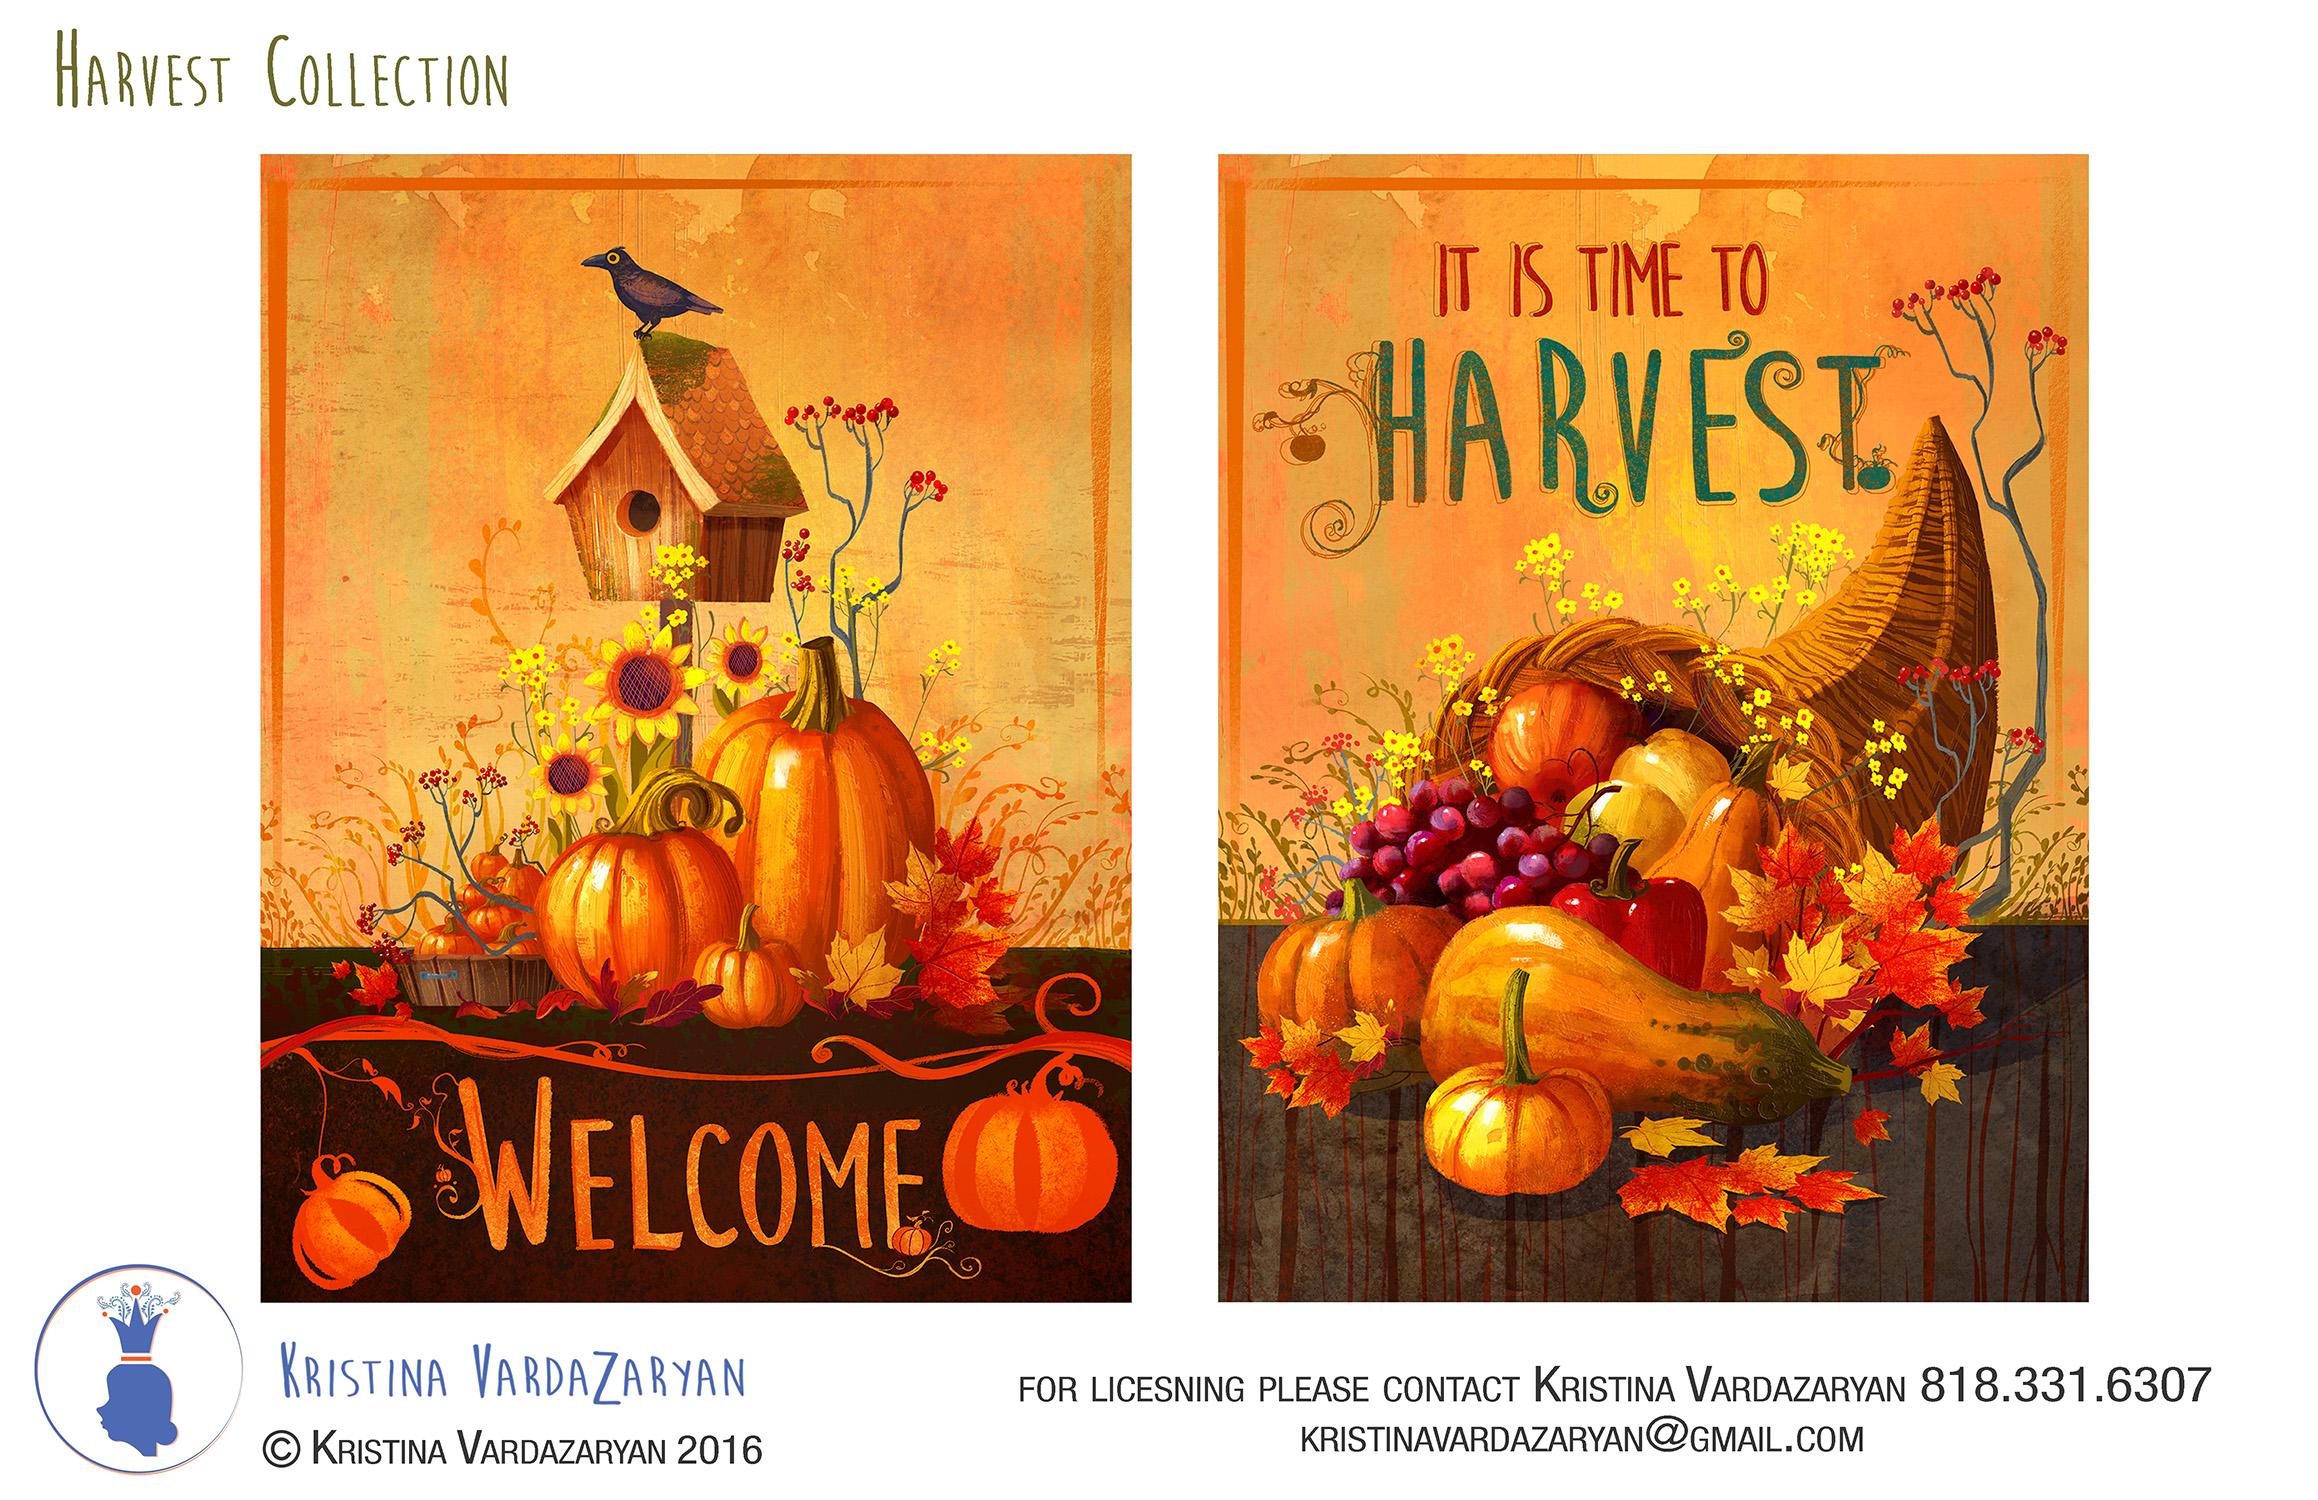 HarvestCollection_KristinaVardazaryan